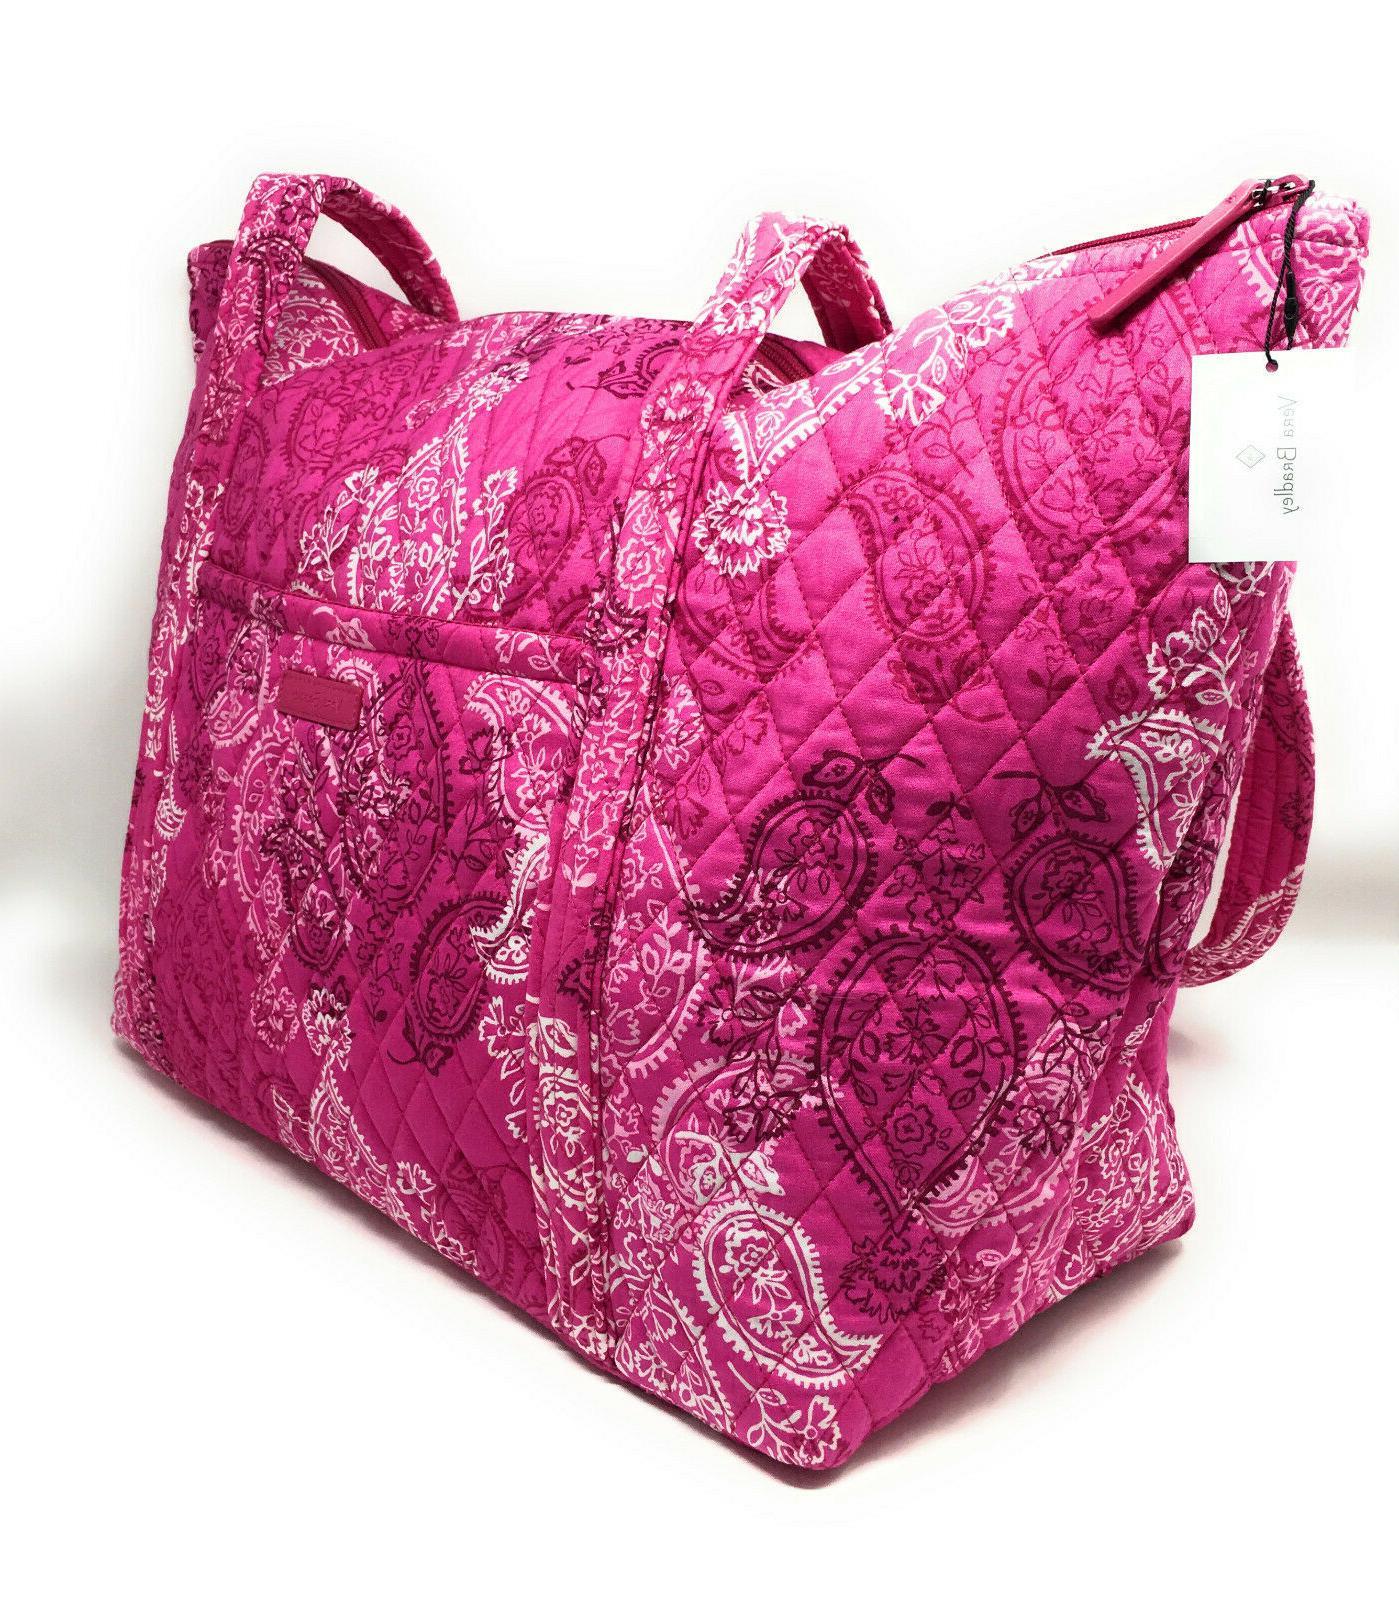 Vera Bradley Bag Carryon in Paisley NWT